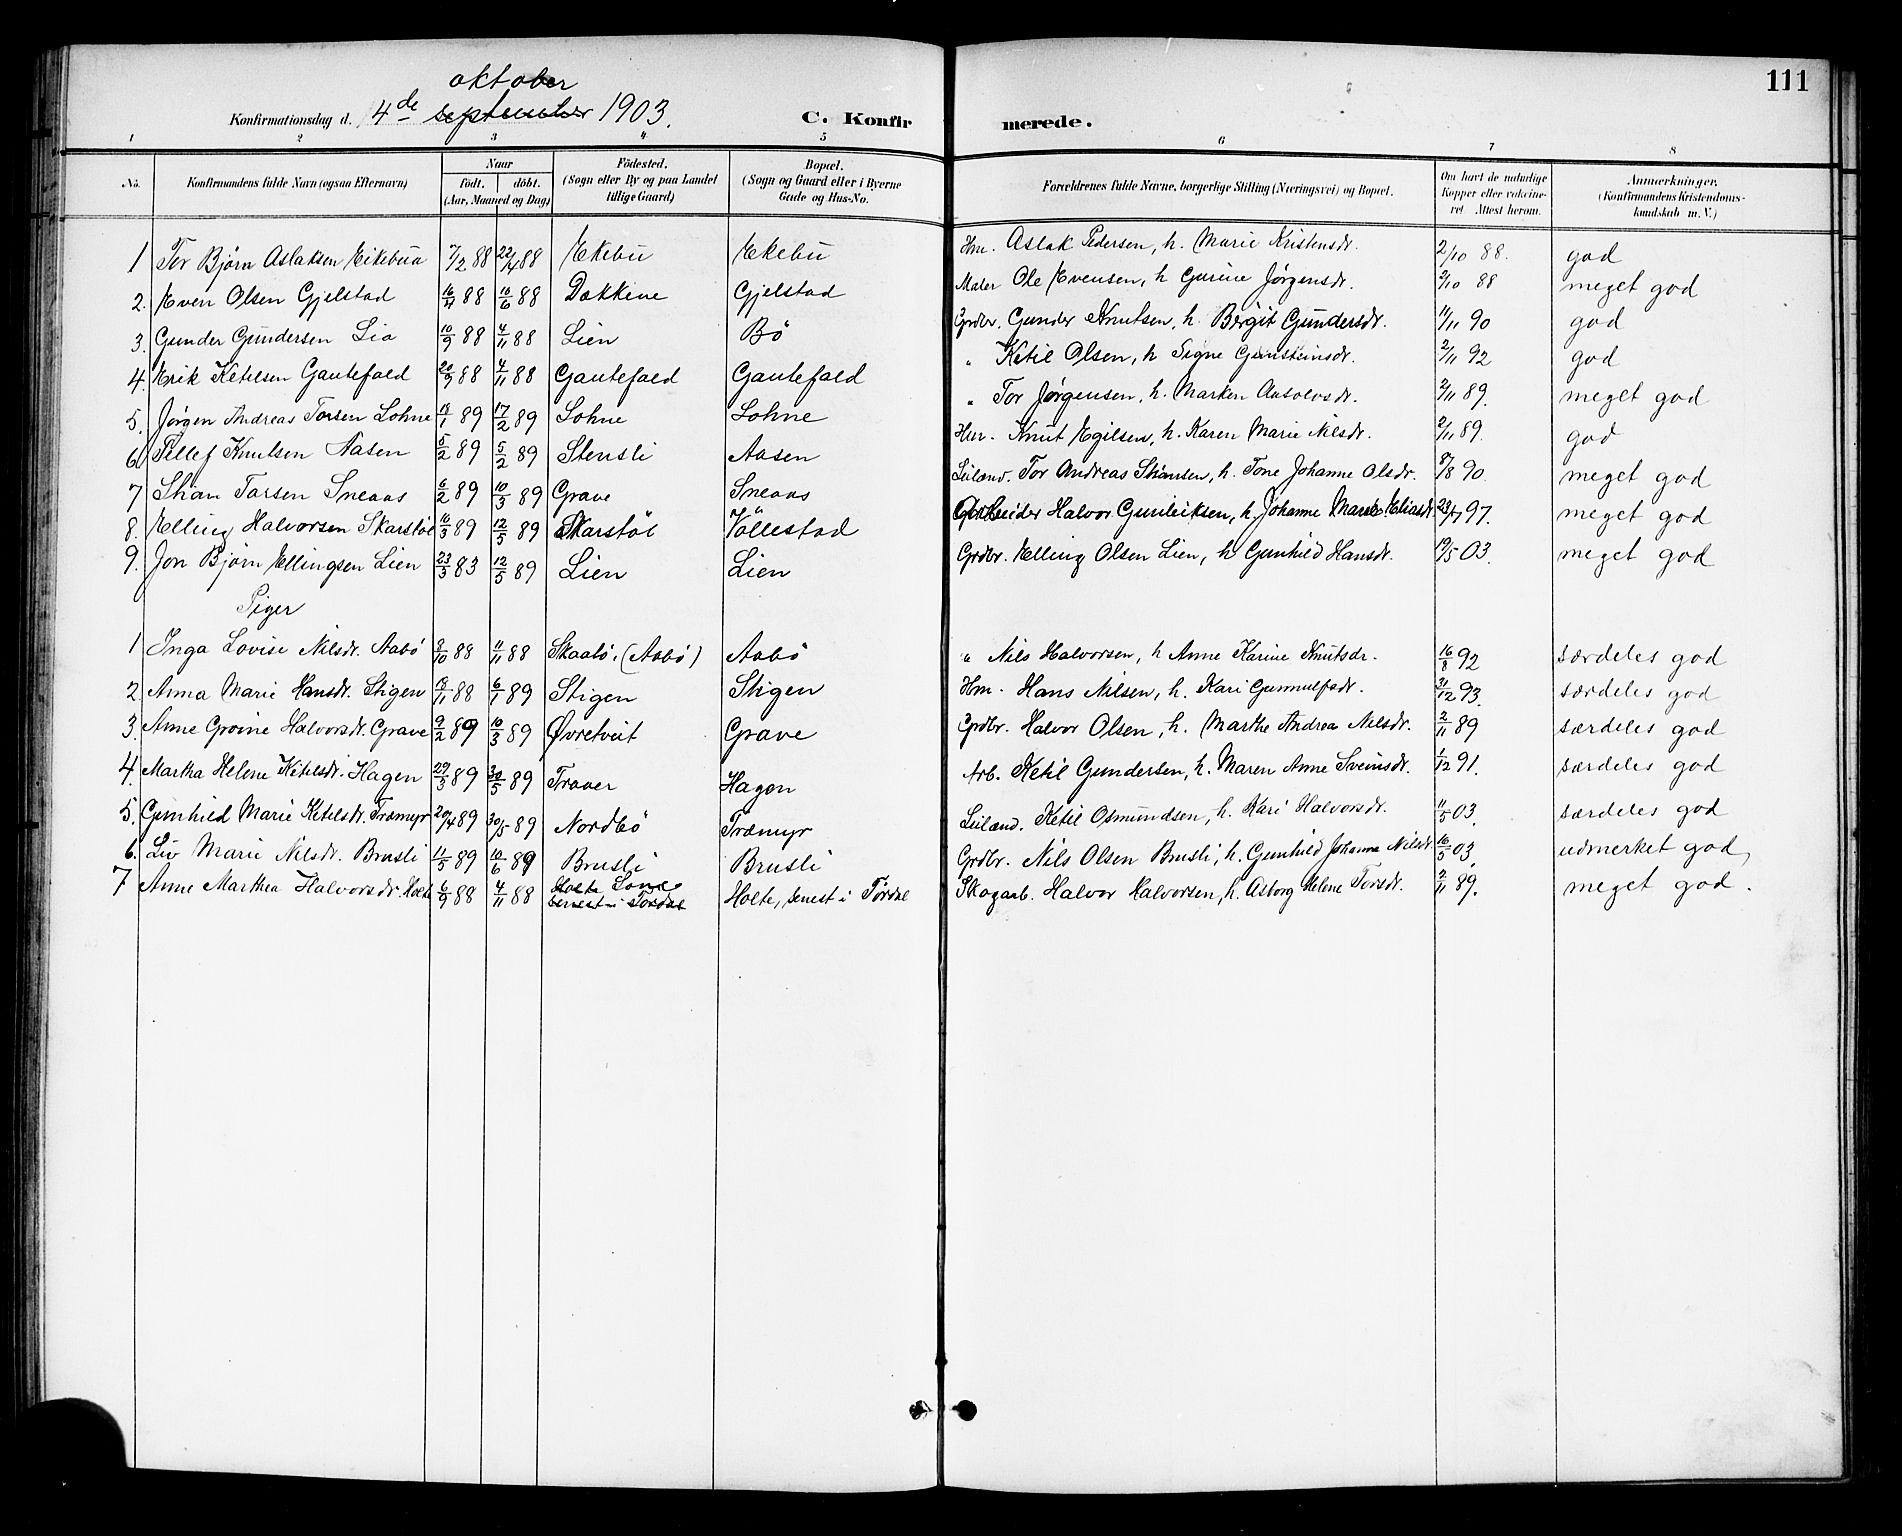 SAKO, Drangedal kirkebøker, G/Gb/L0002: Klokkerbok nr. II 2, 1895-1918, s. 111